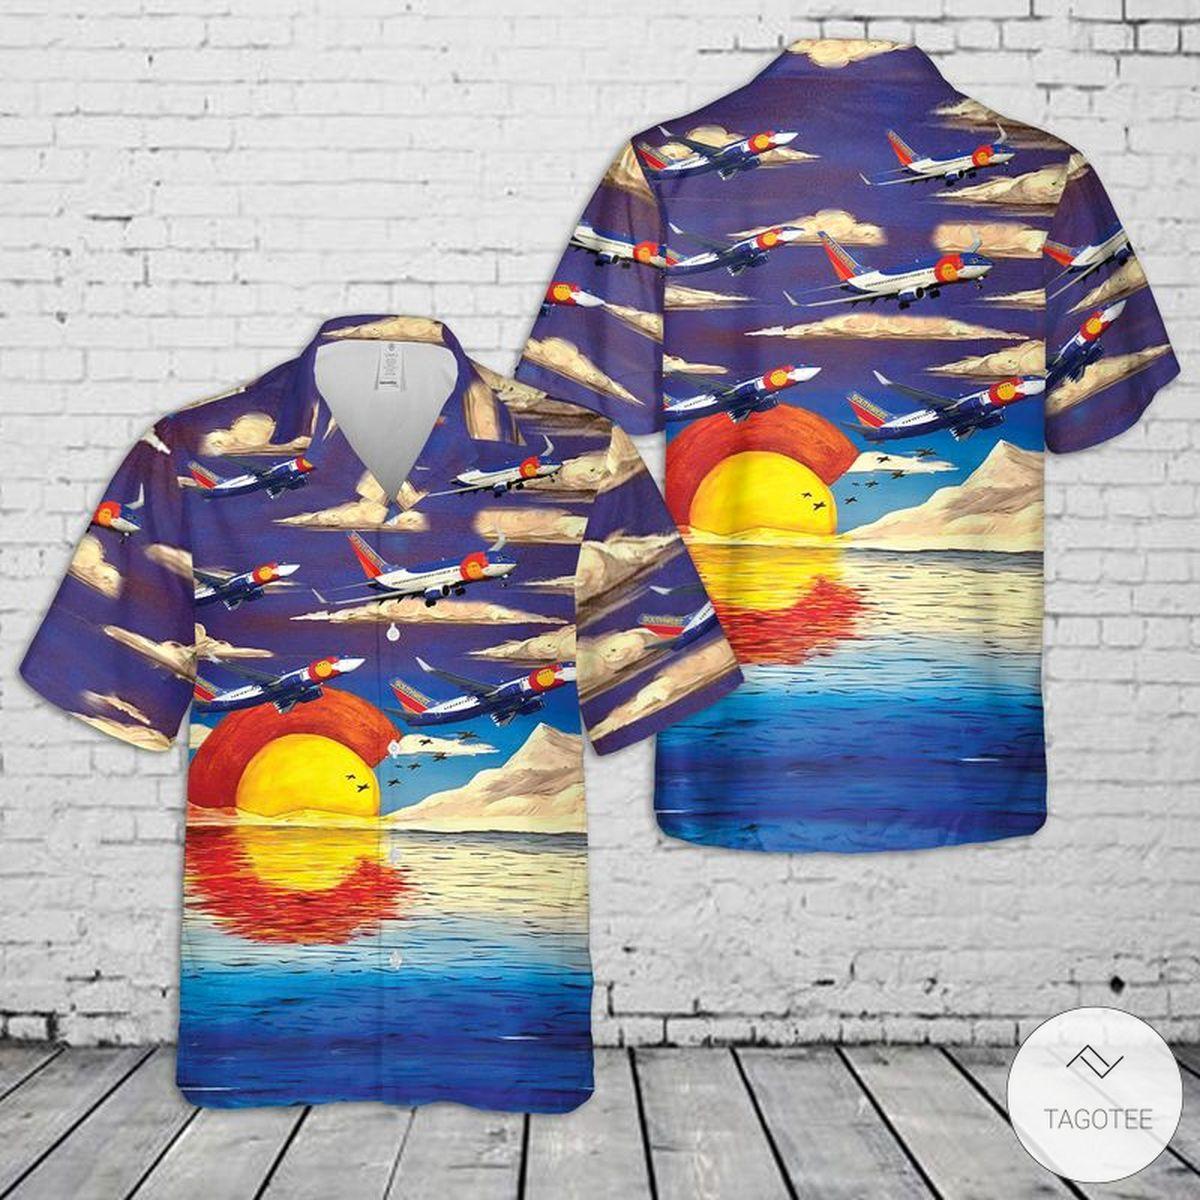 Southwest Airlines Colorado One Boeing 737-7H4 Hawaiian Shirt, Beach Shorts